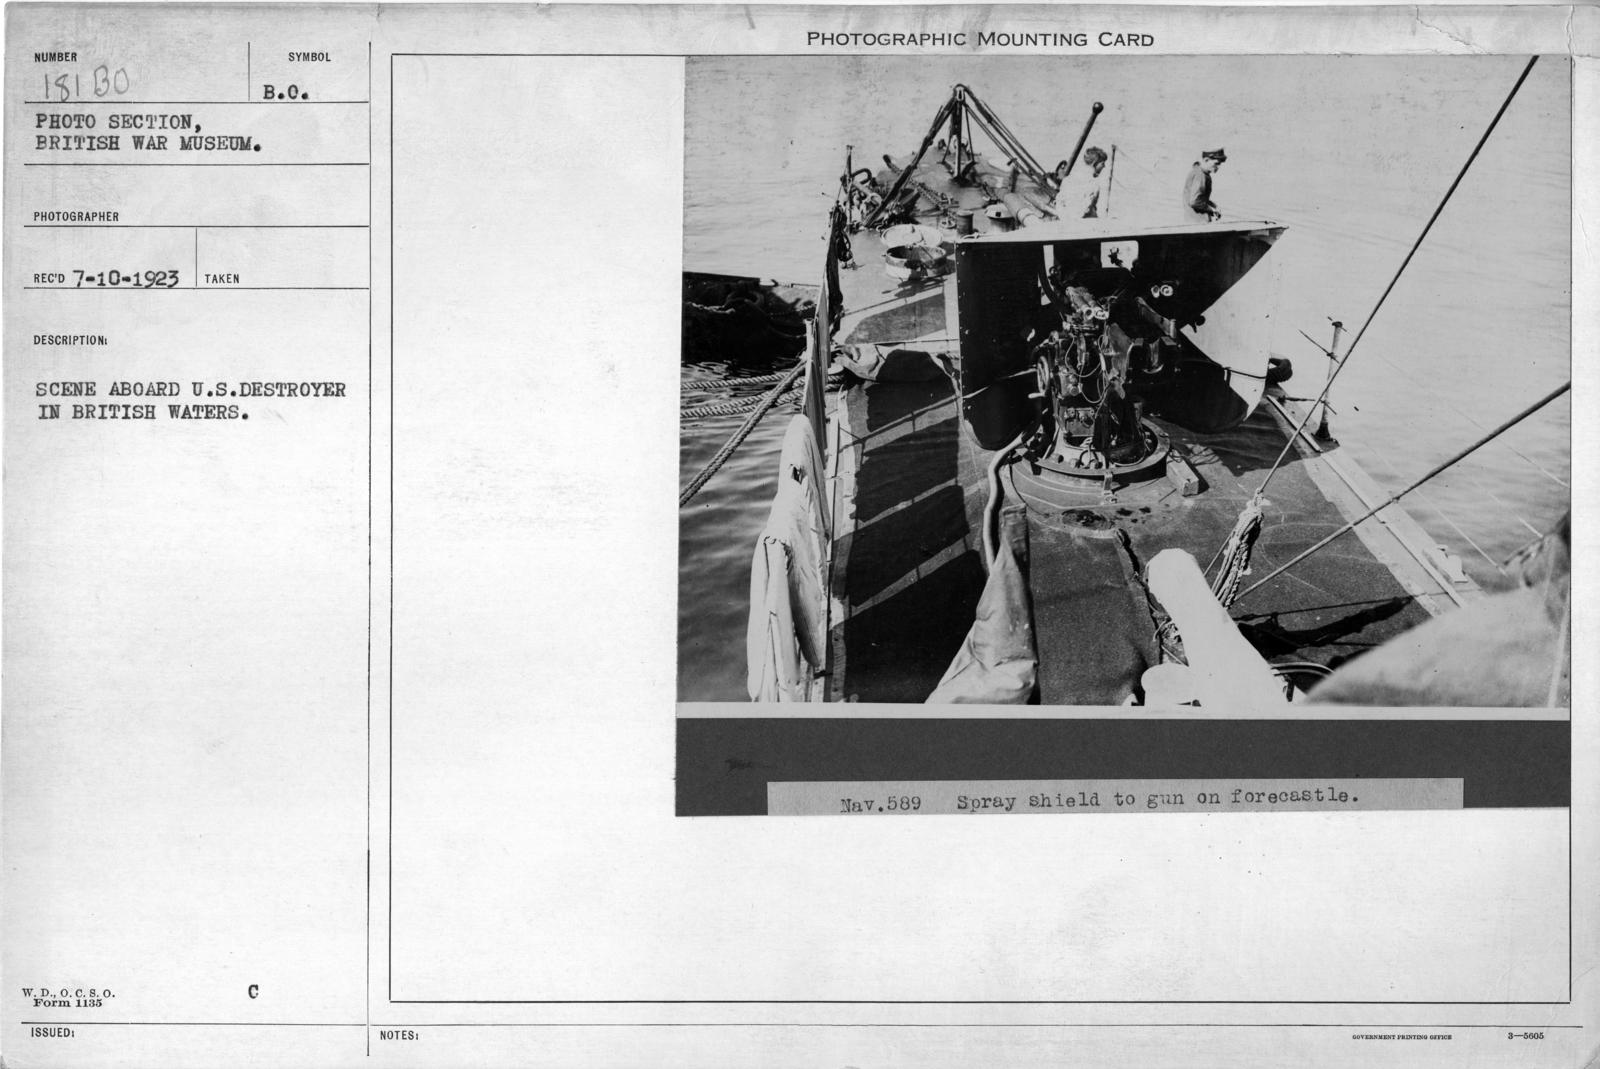 Scene aboard U.S. Destroyer in British waters